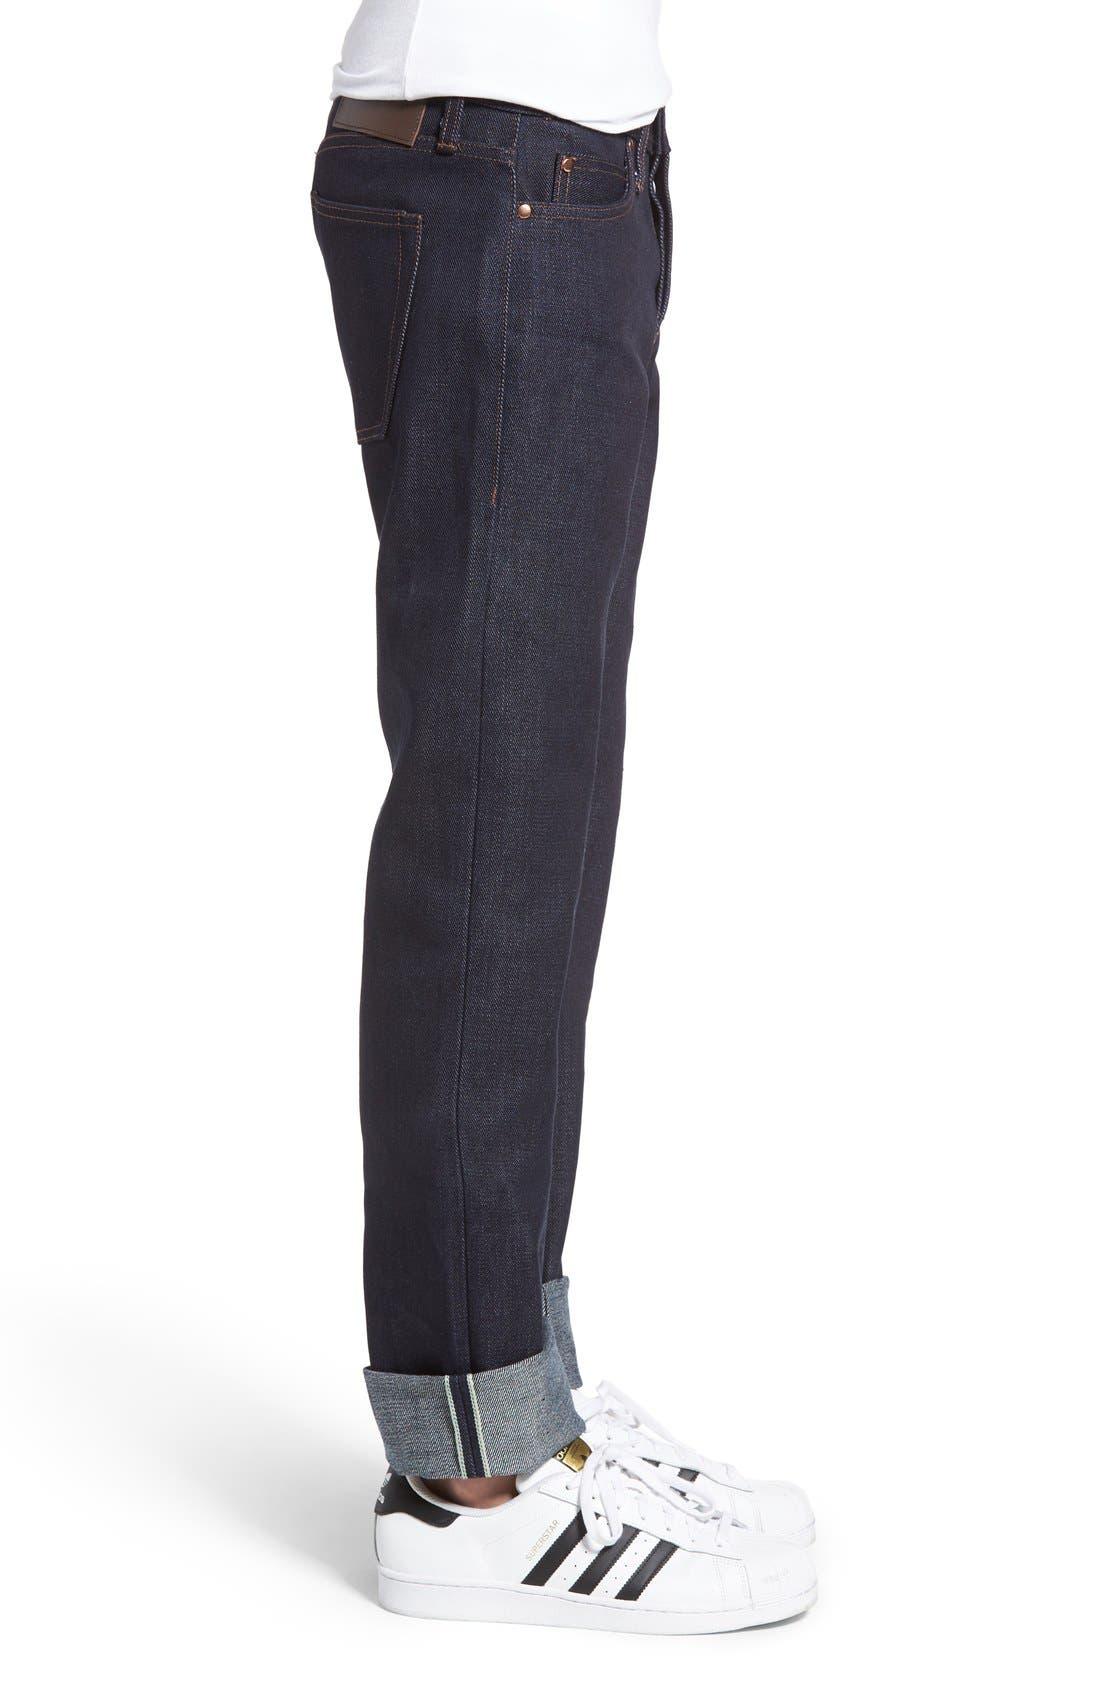 UB121 Selvedge Skinny Fit Jeans,                             Alternate thumbnail 3, color,                             401